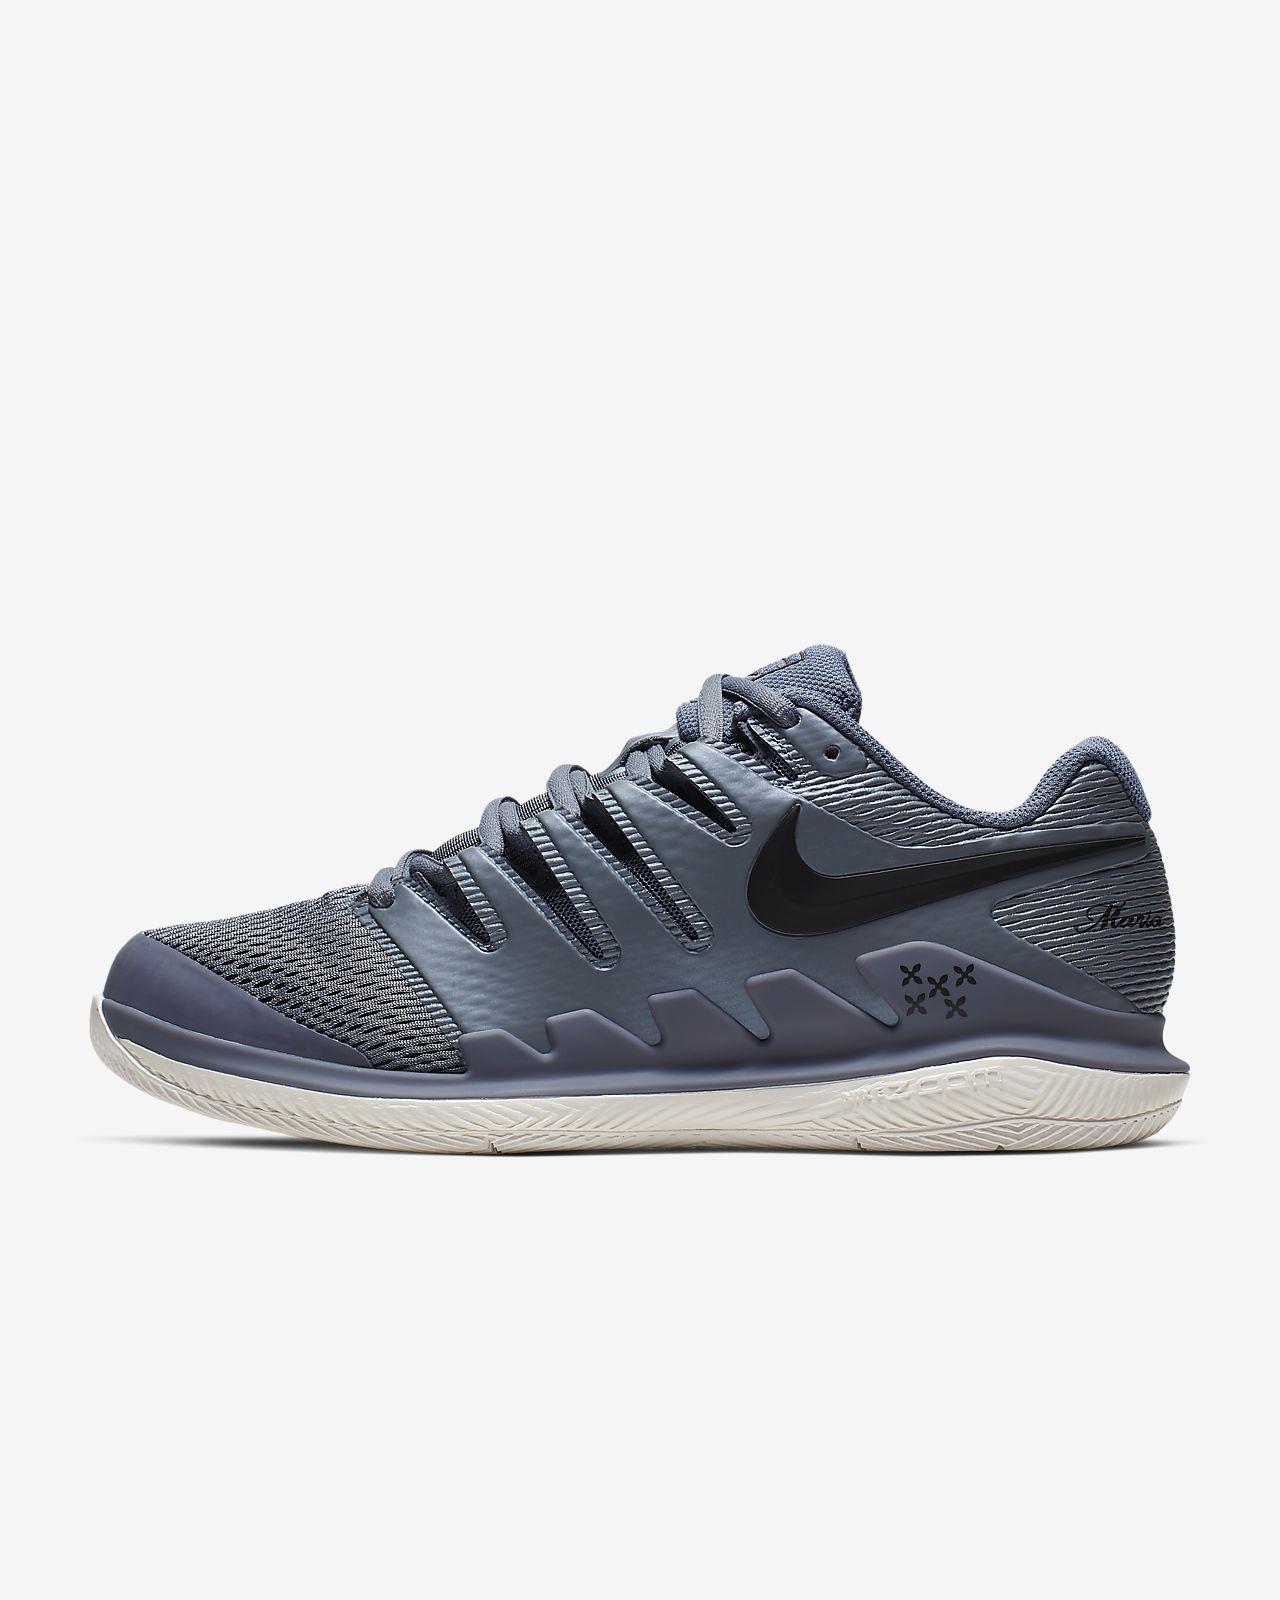 NikeCourt Air Zoom Vapor X Women's Hard Court Tennis Shoe